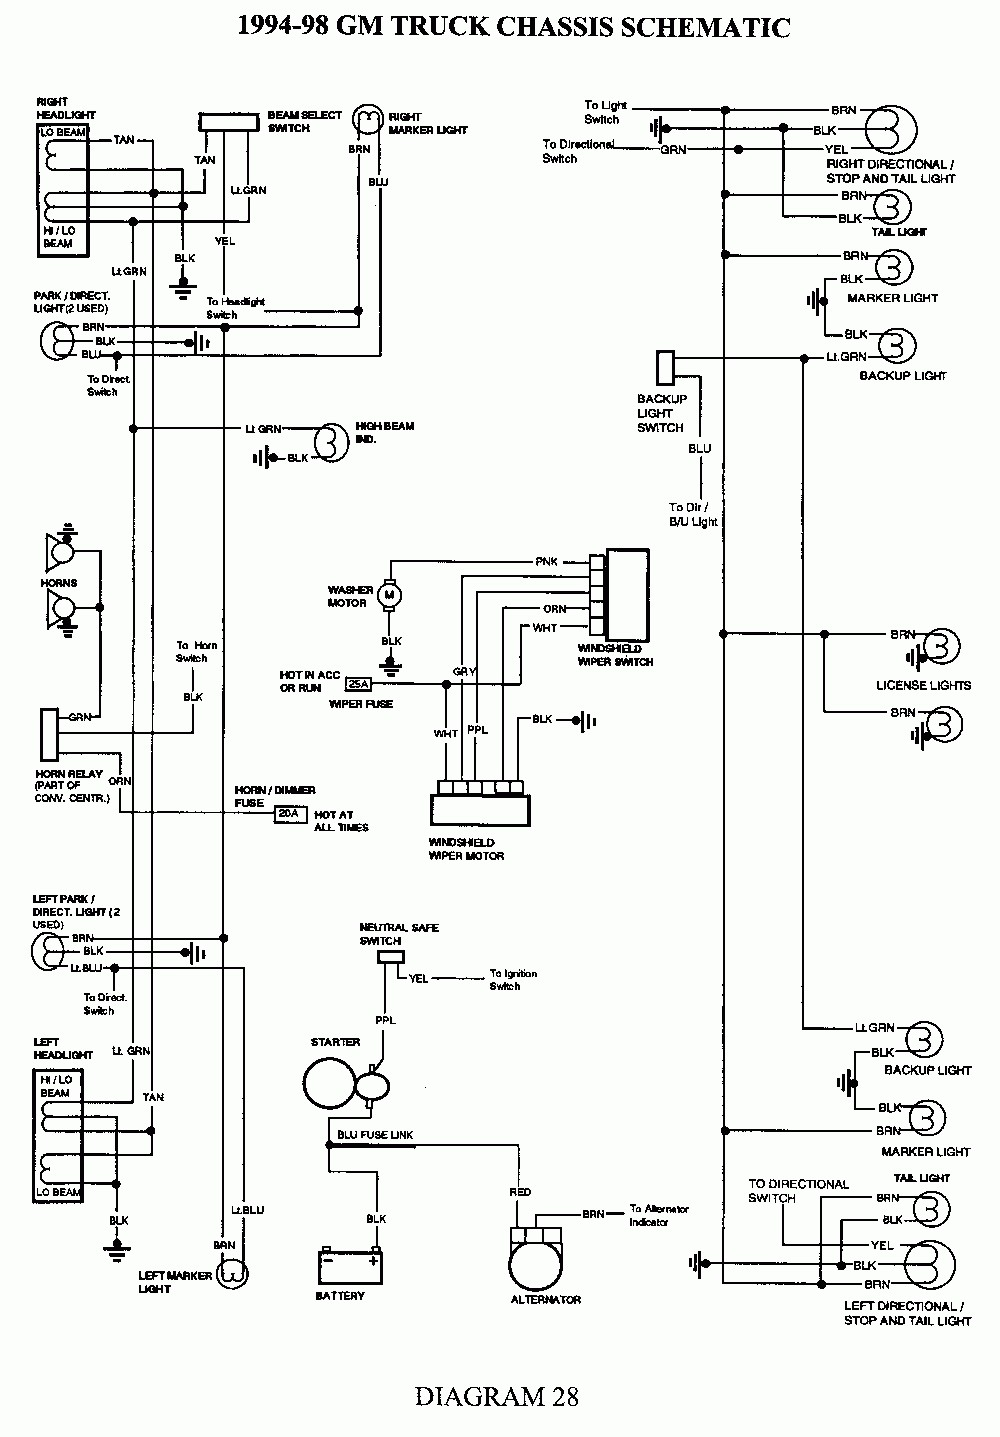 hight resolution of 1991 chevrolet suburban wiring diagram wiring library 2004 sierra wiring diagram 1991 chevrolet suburban headlight wiring